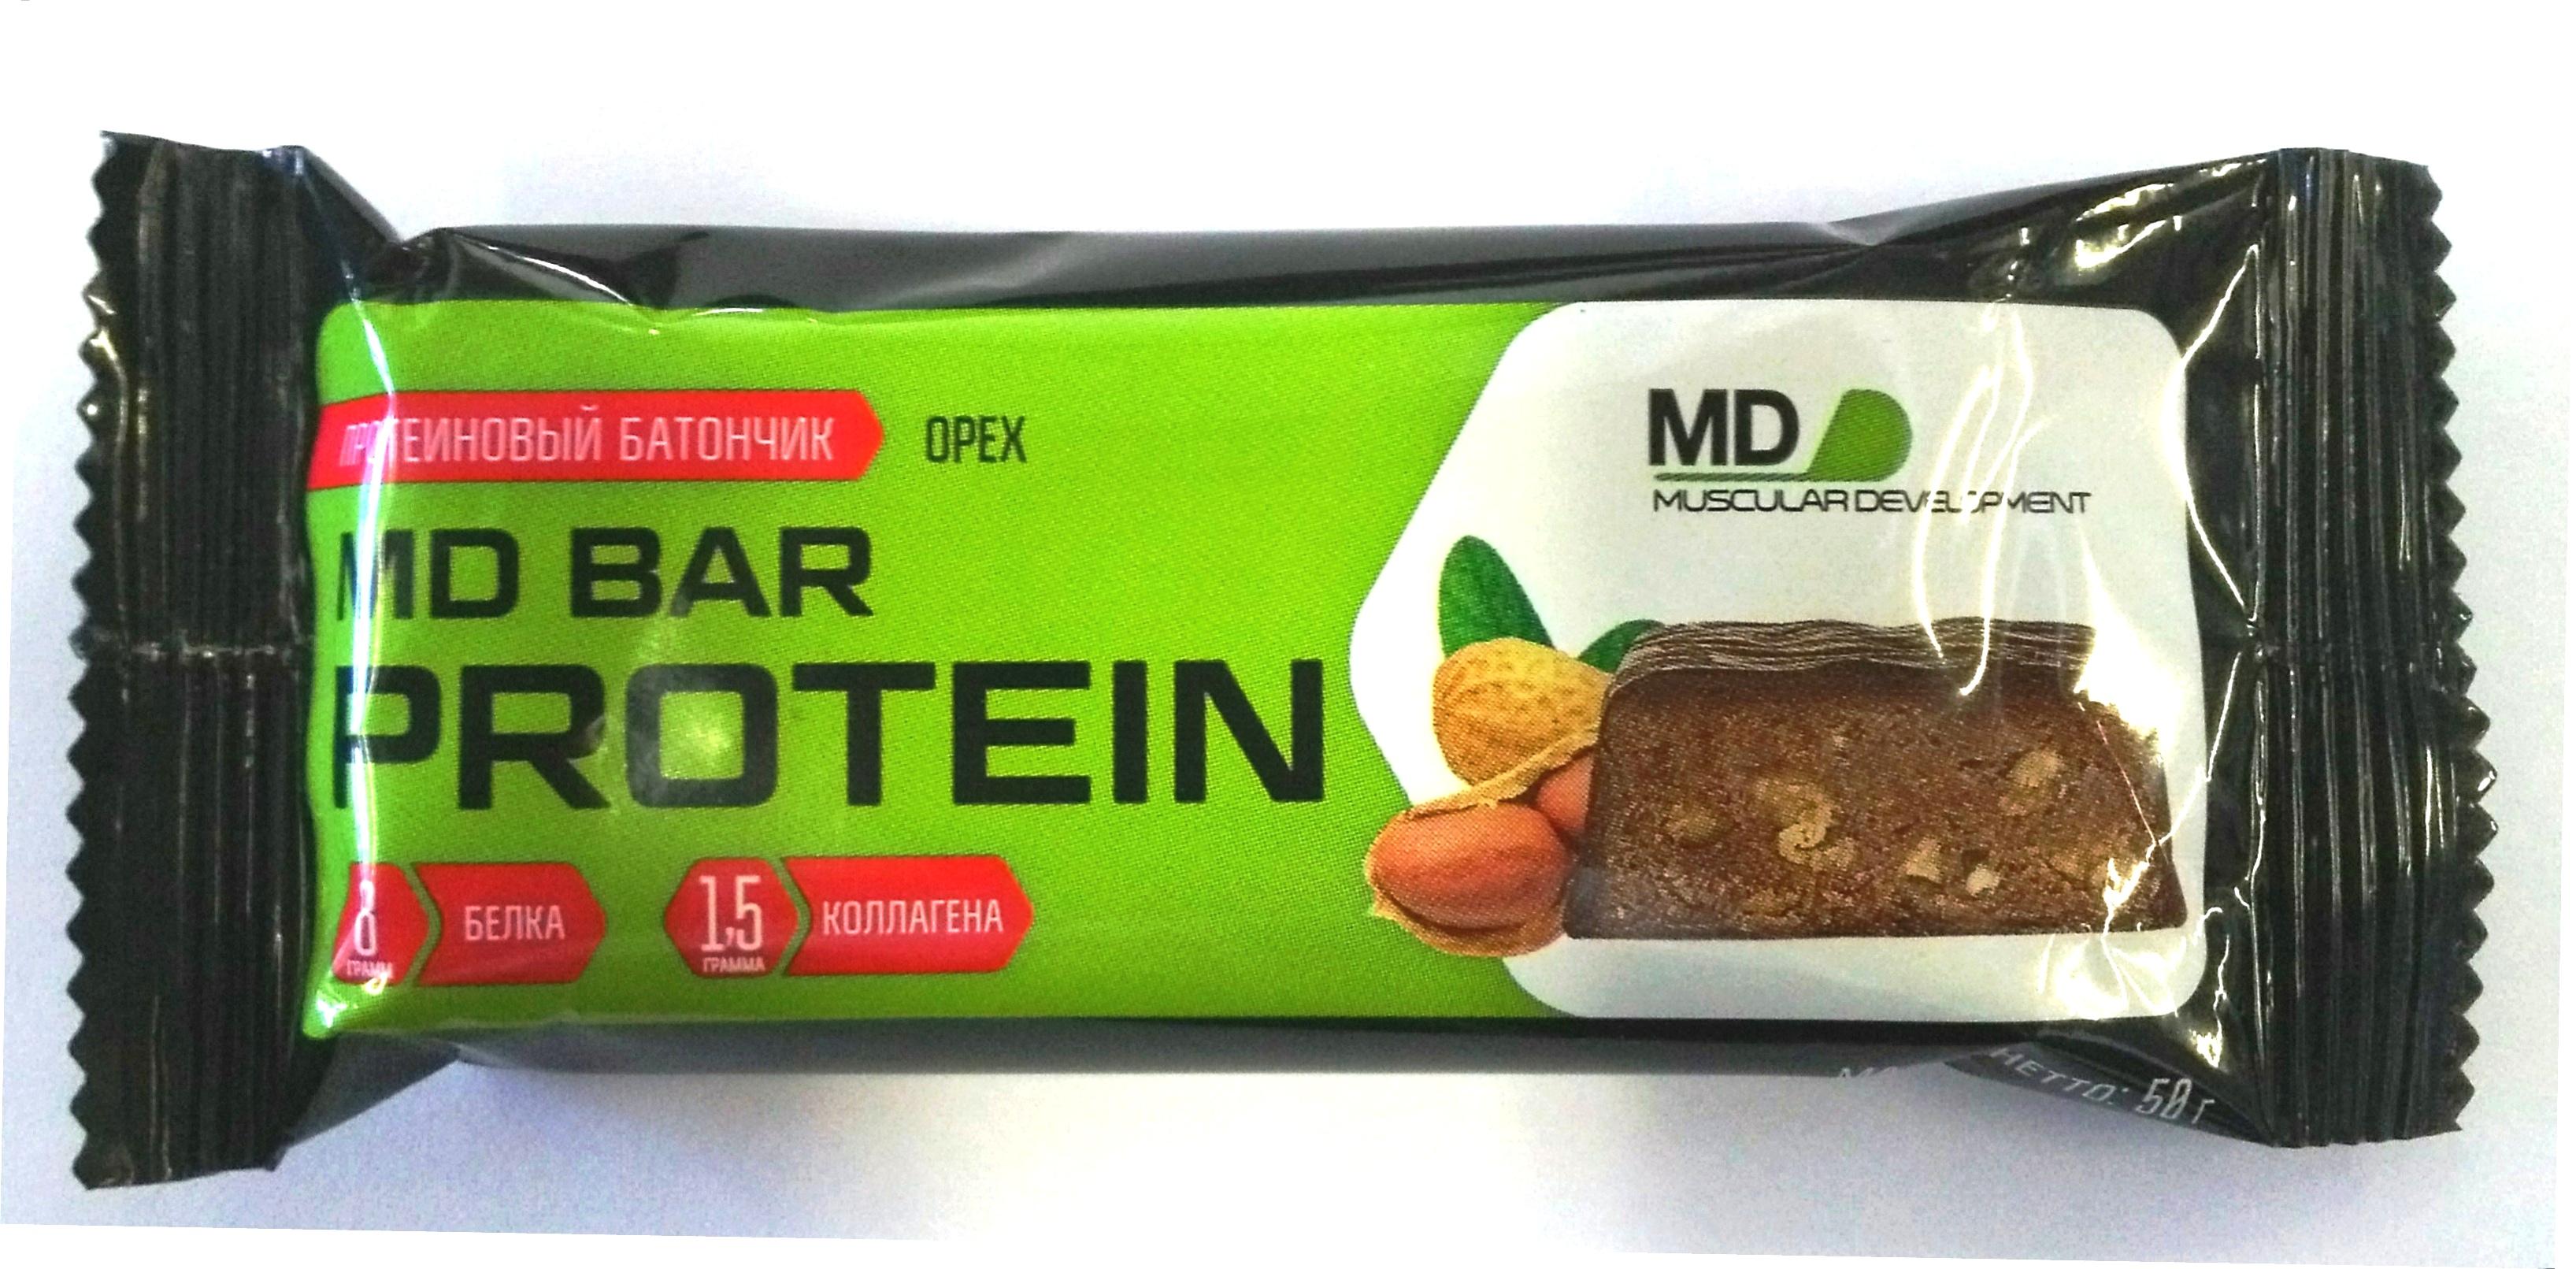 Батончик с протеином MD Bar, вкус